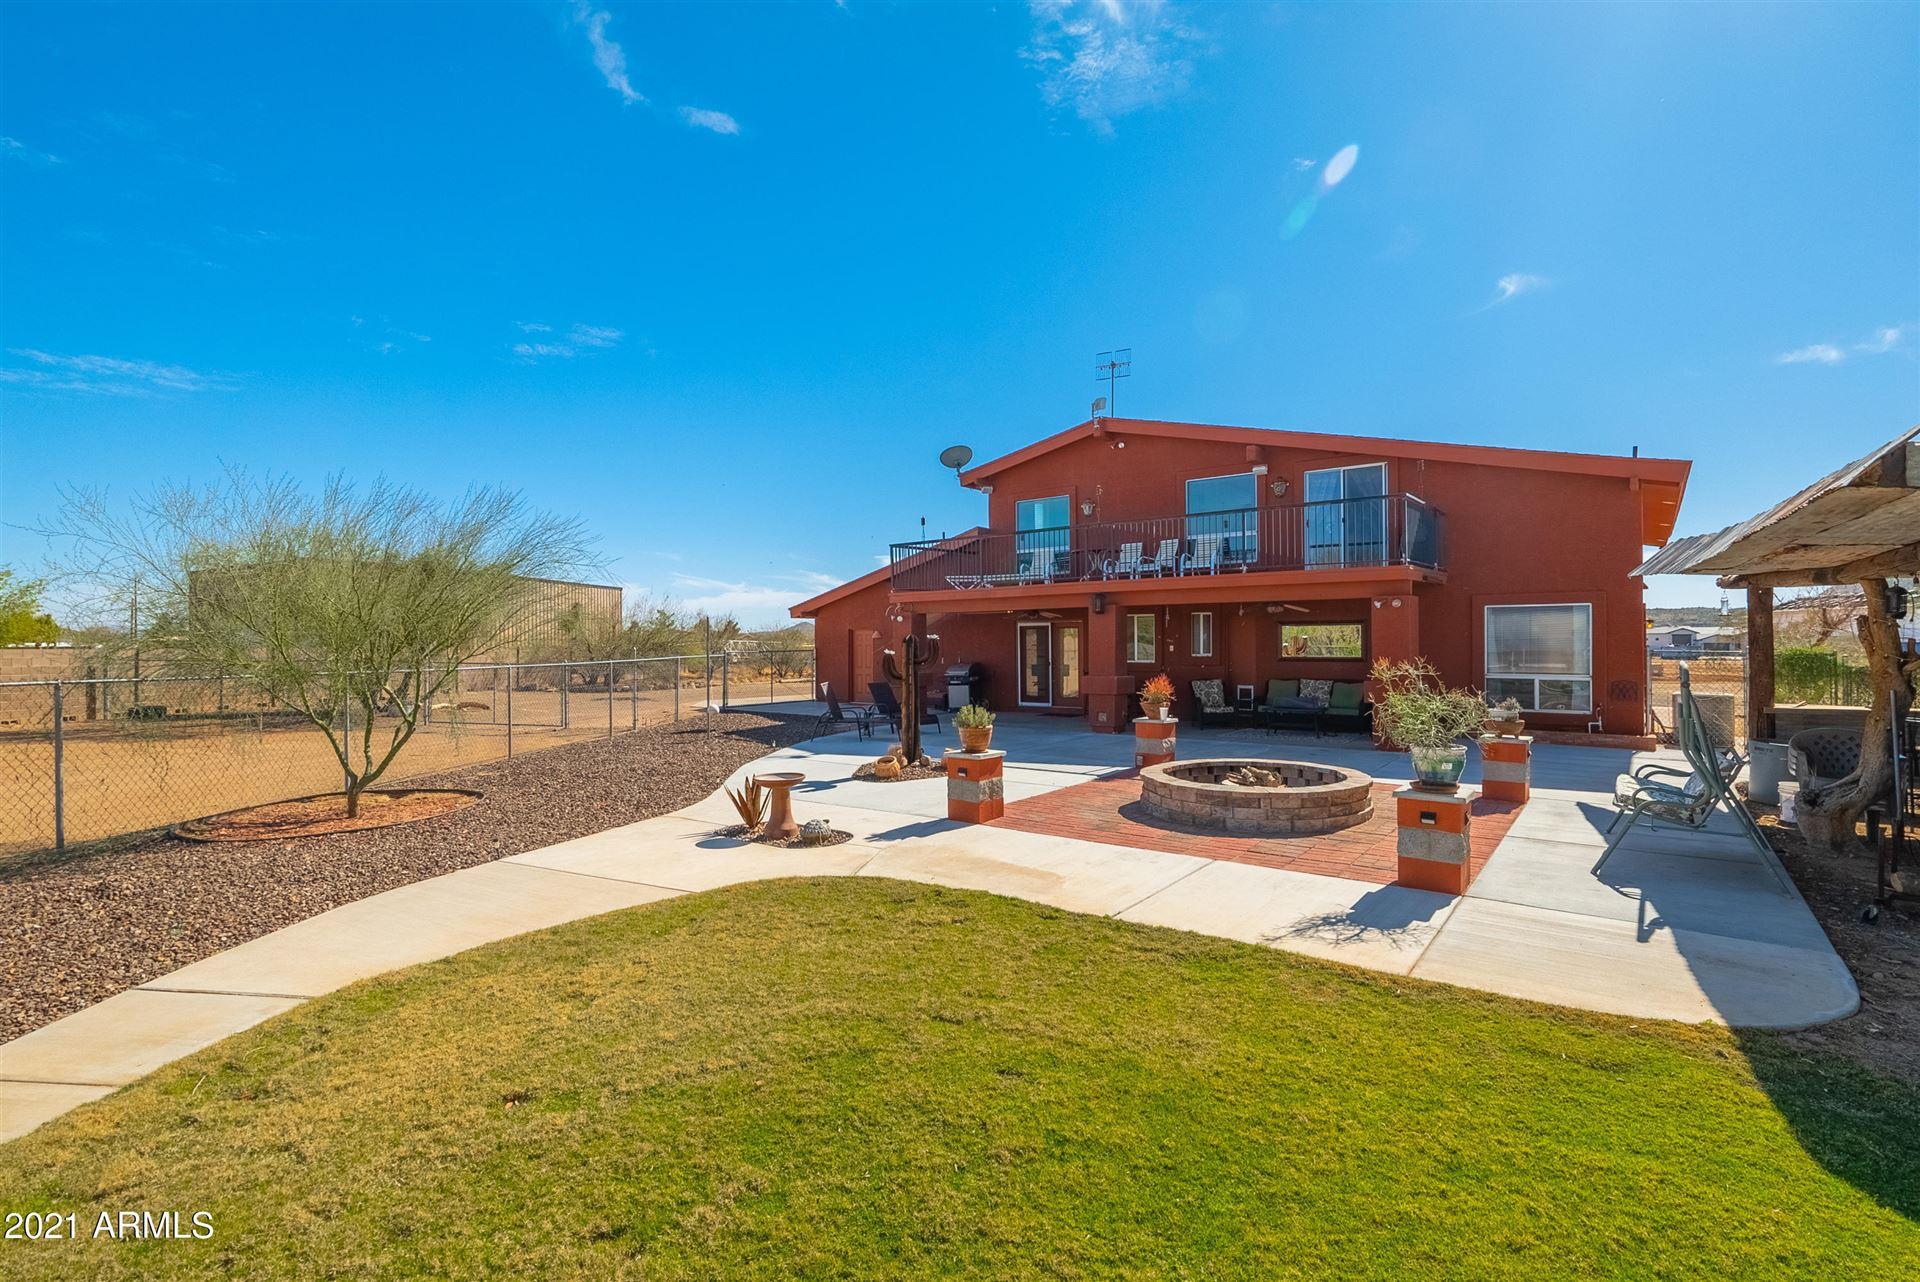 Photo of 906 W CARLISE Road, Phoenix, AZ 85086 (MLS # 6197951)